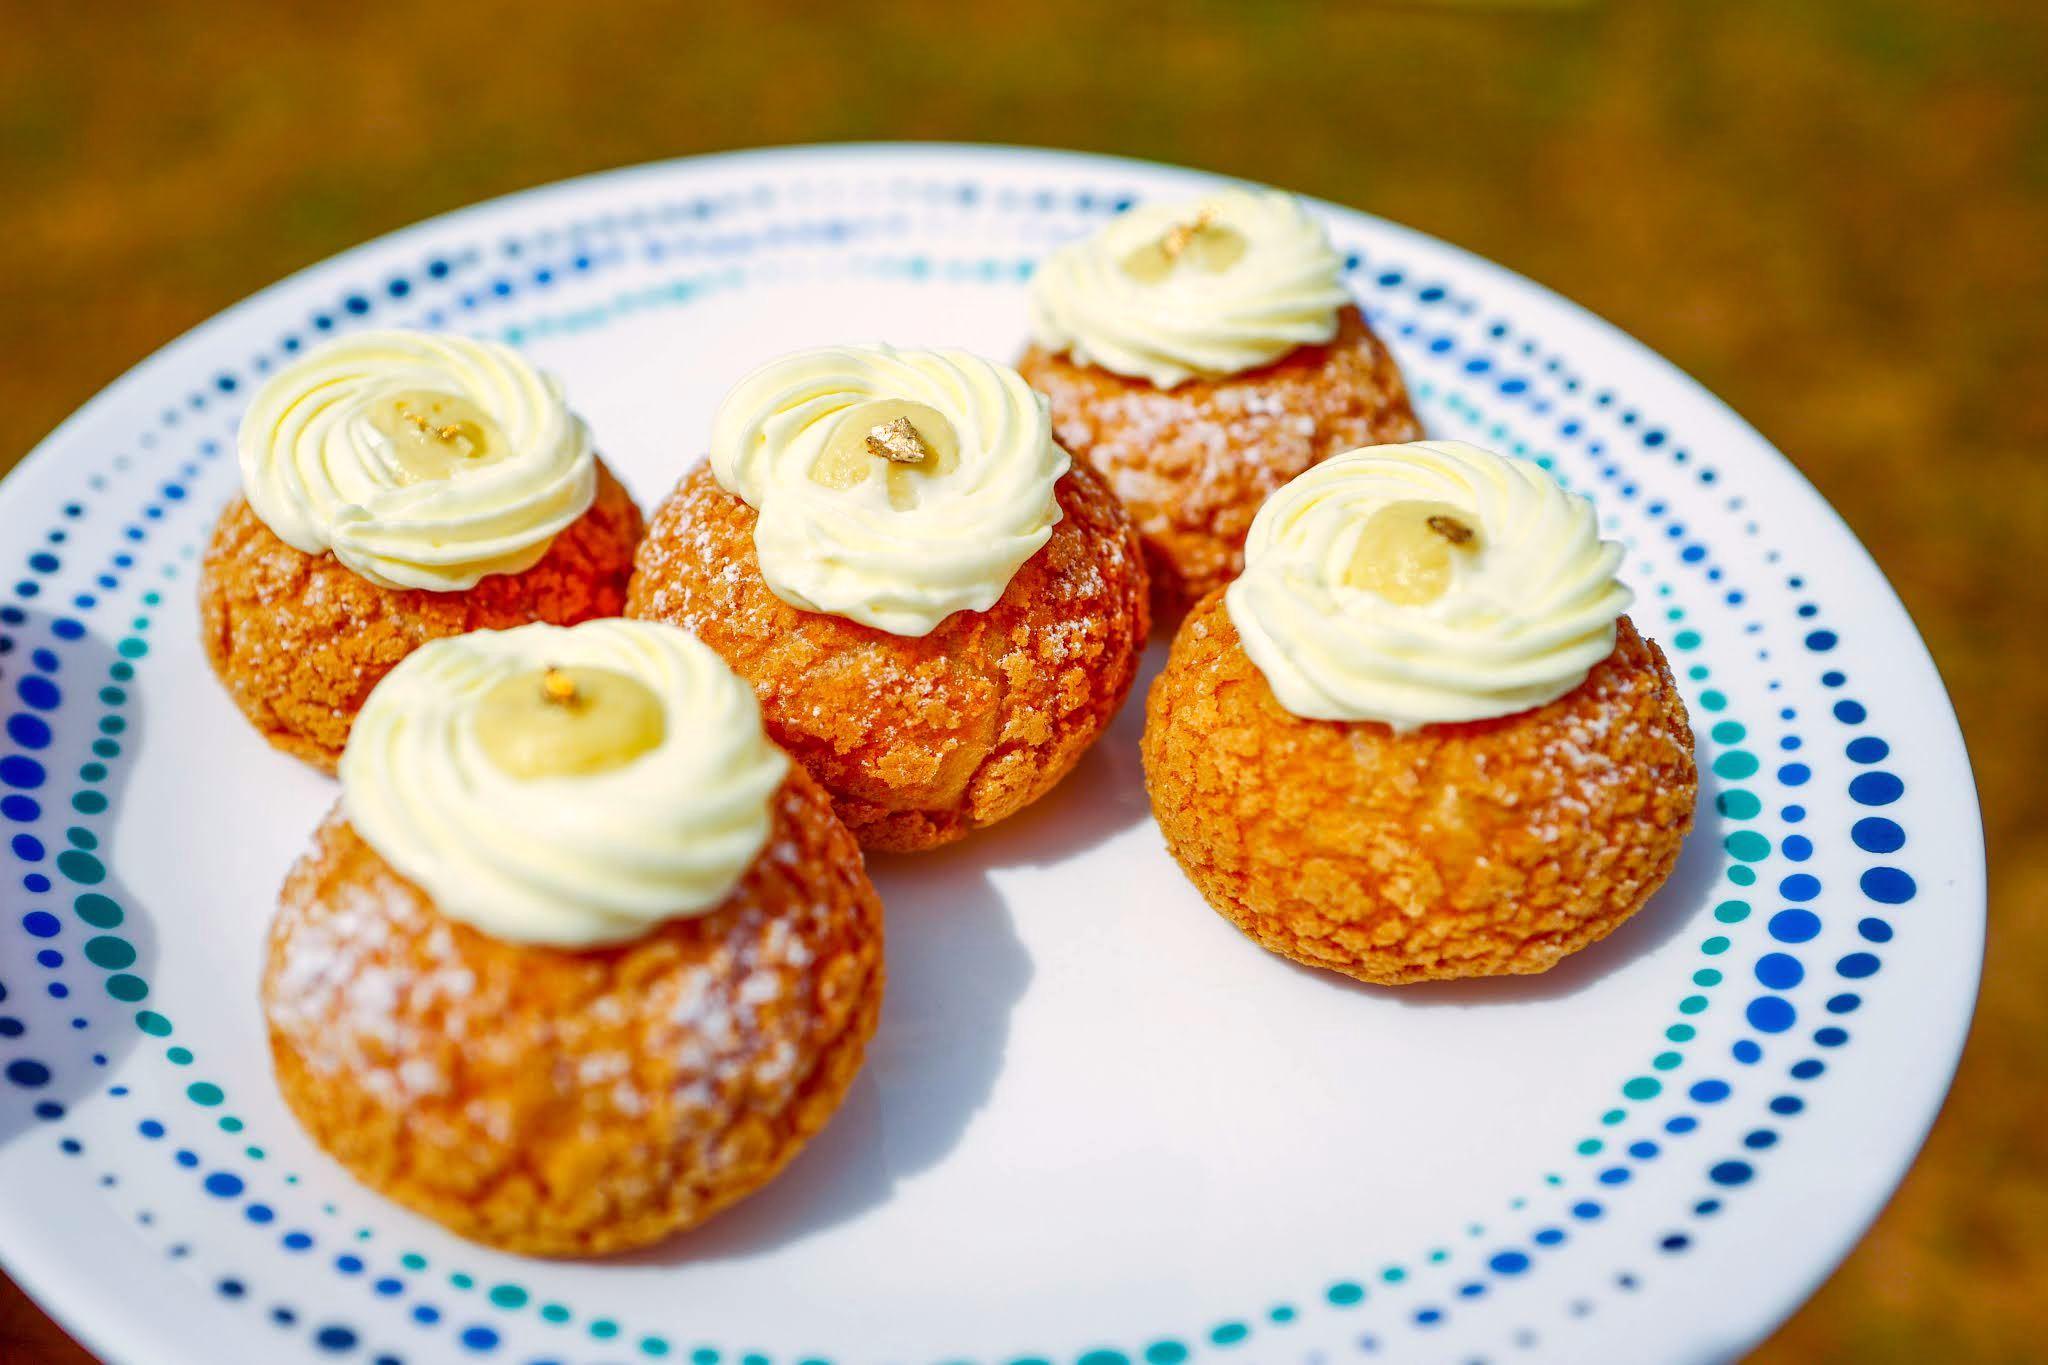 mj bakes choux: musang king choux